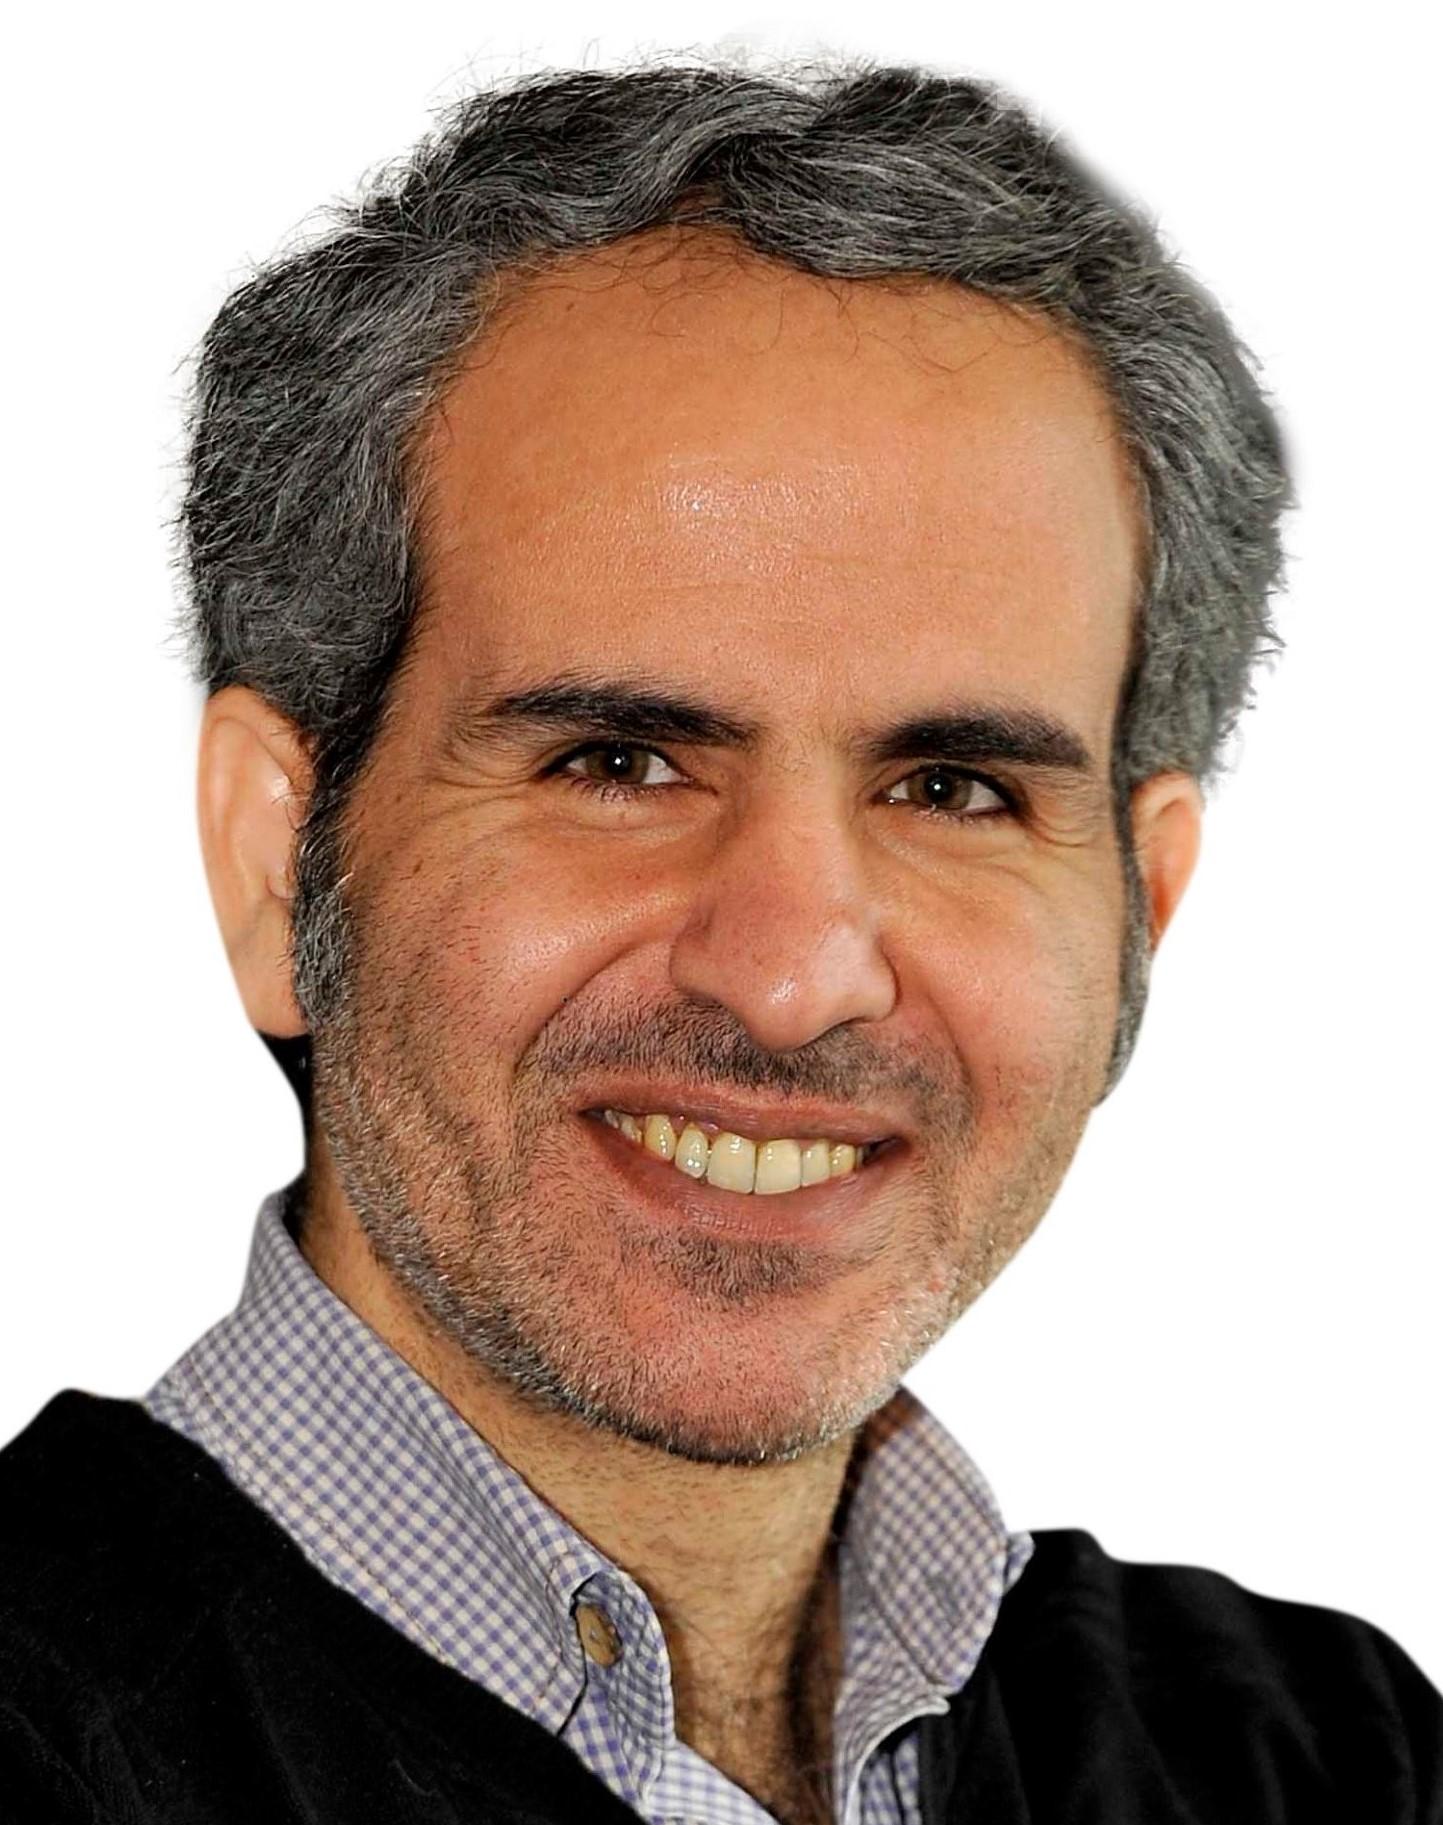 حسين البدري